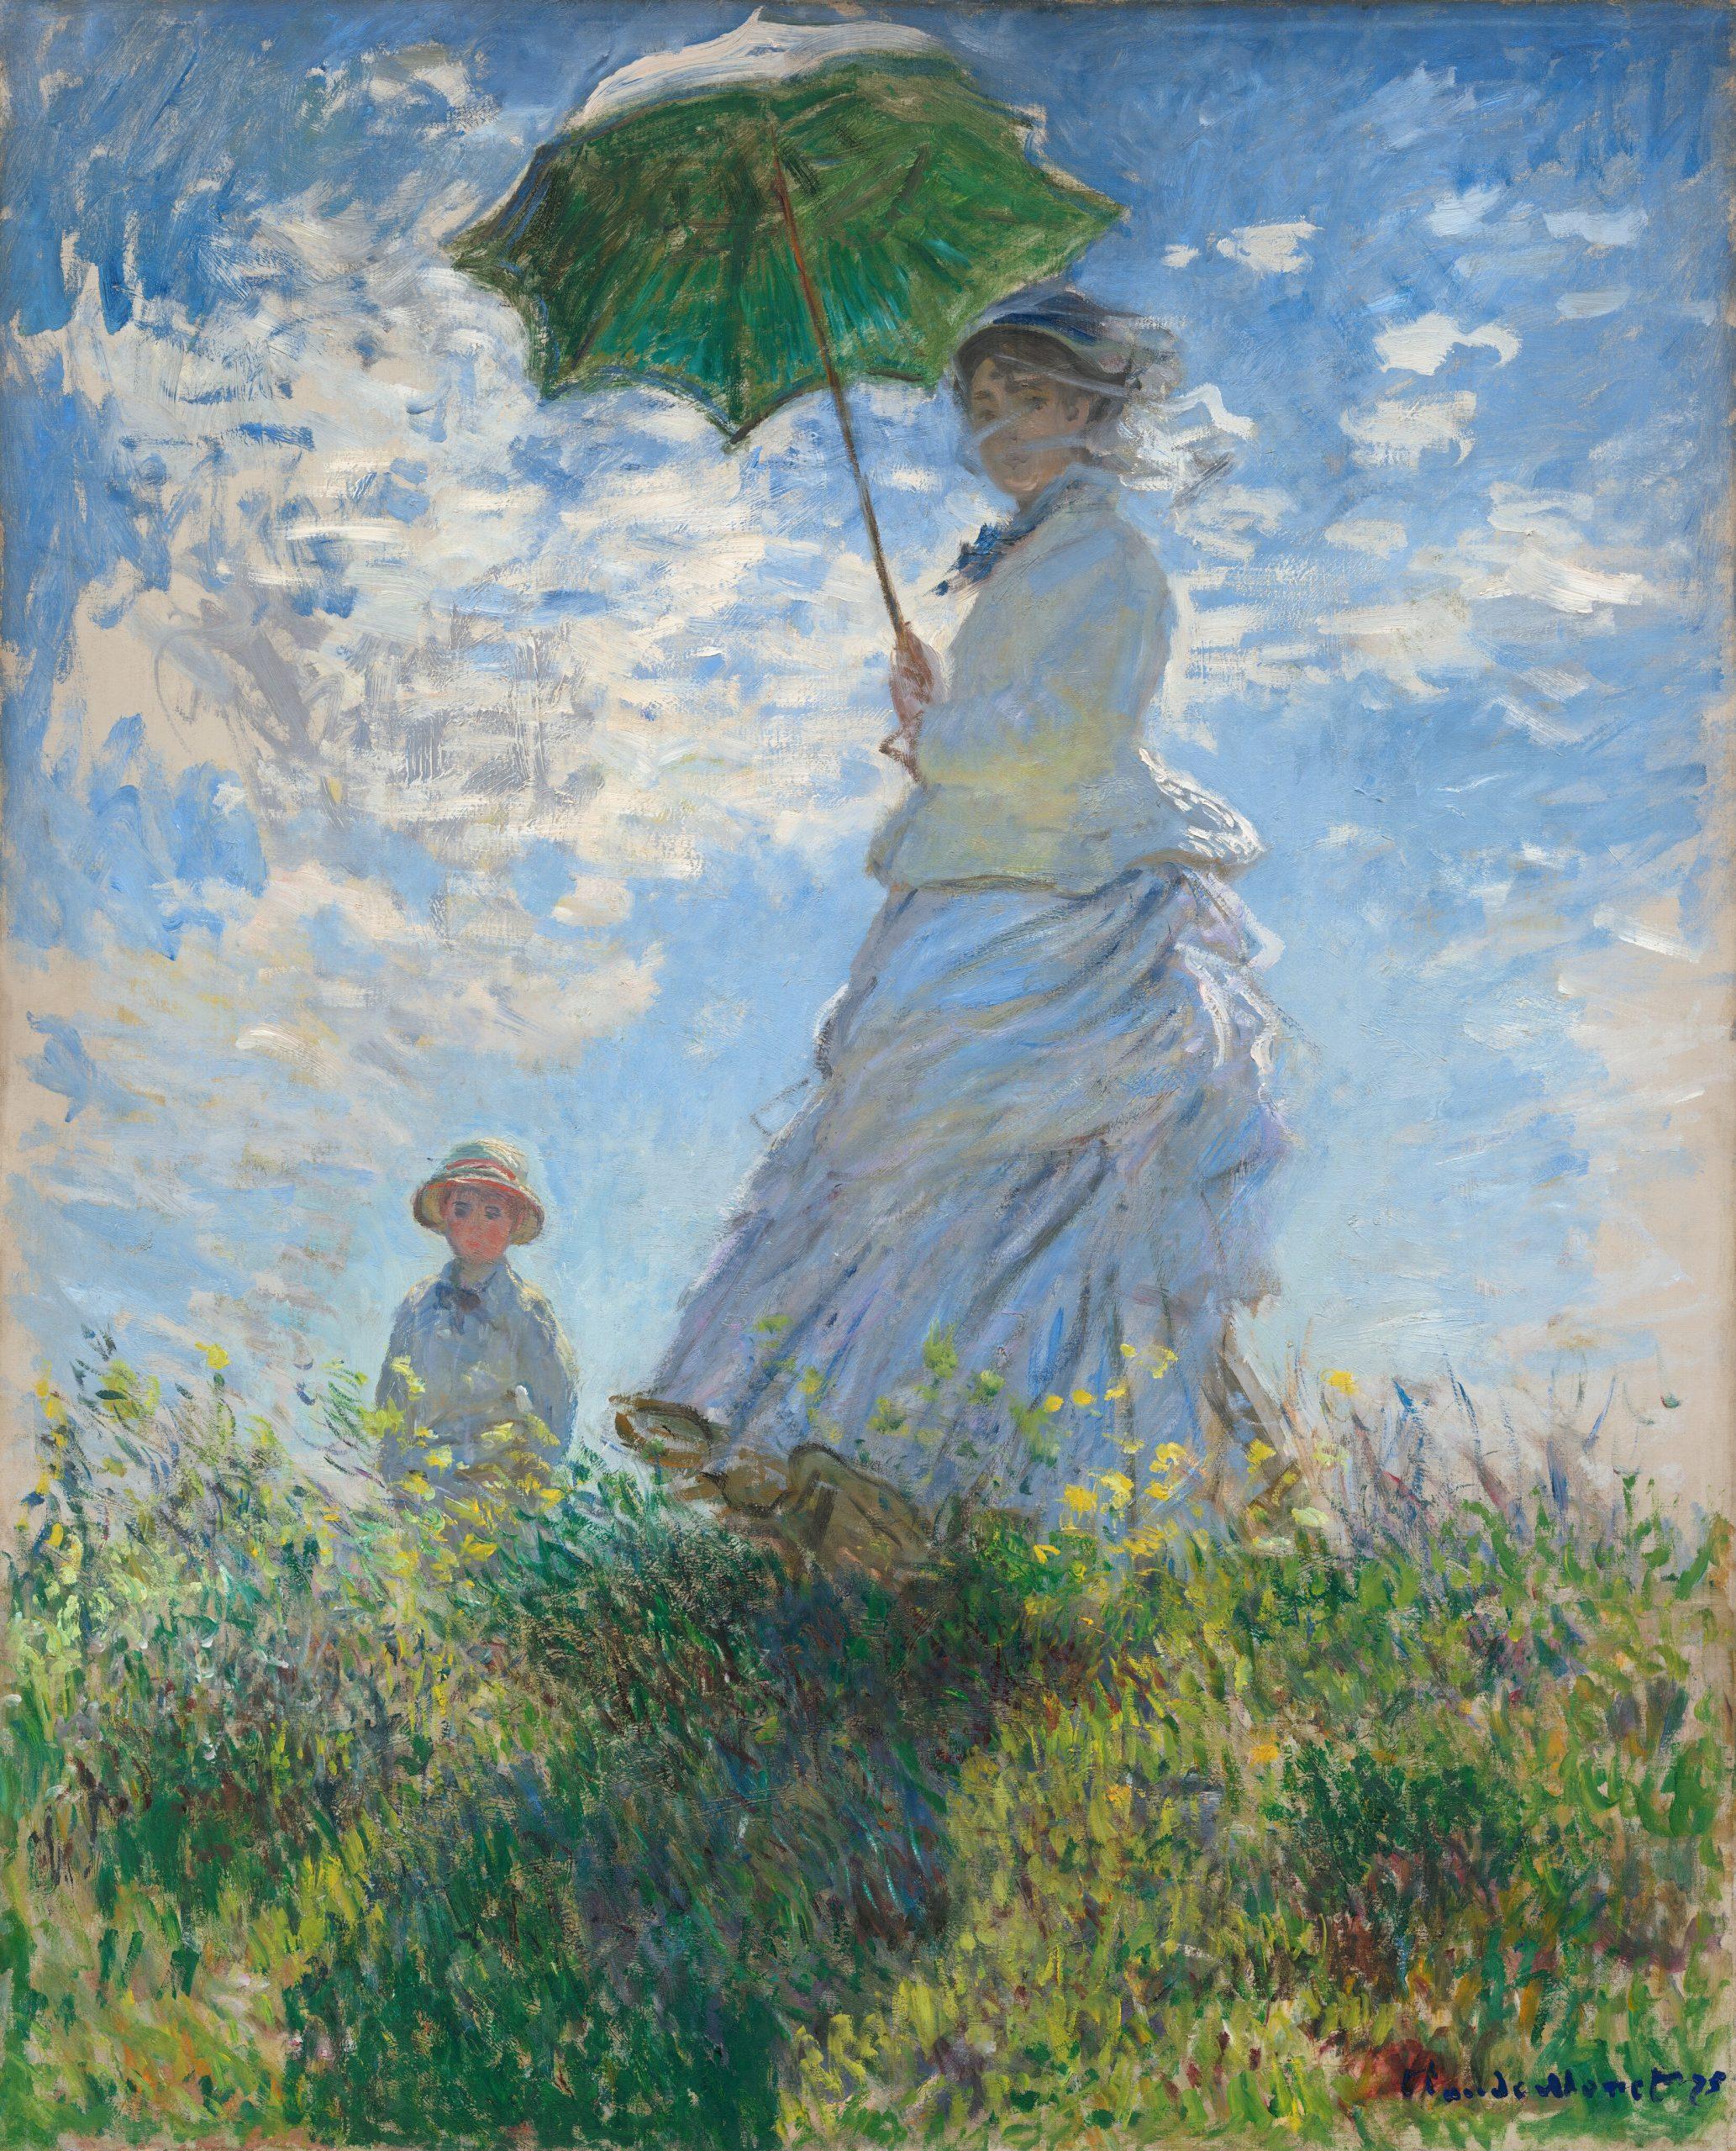 Woman with a Parasol, Claude Monet